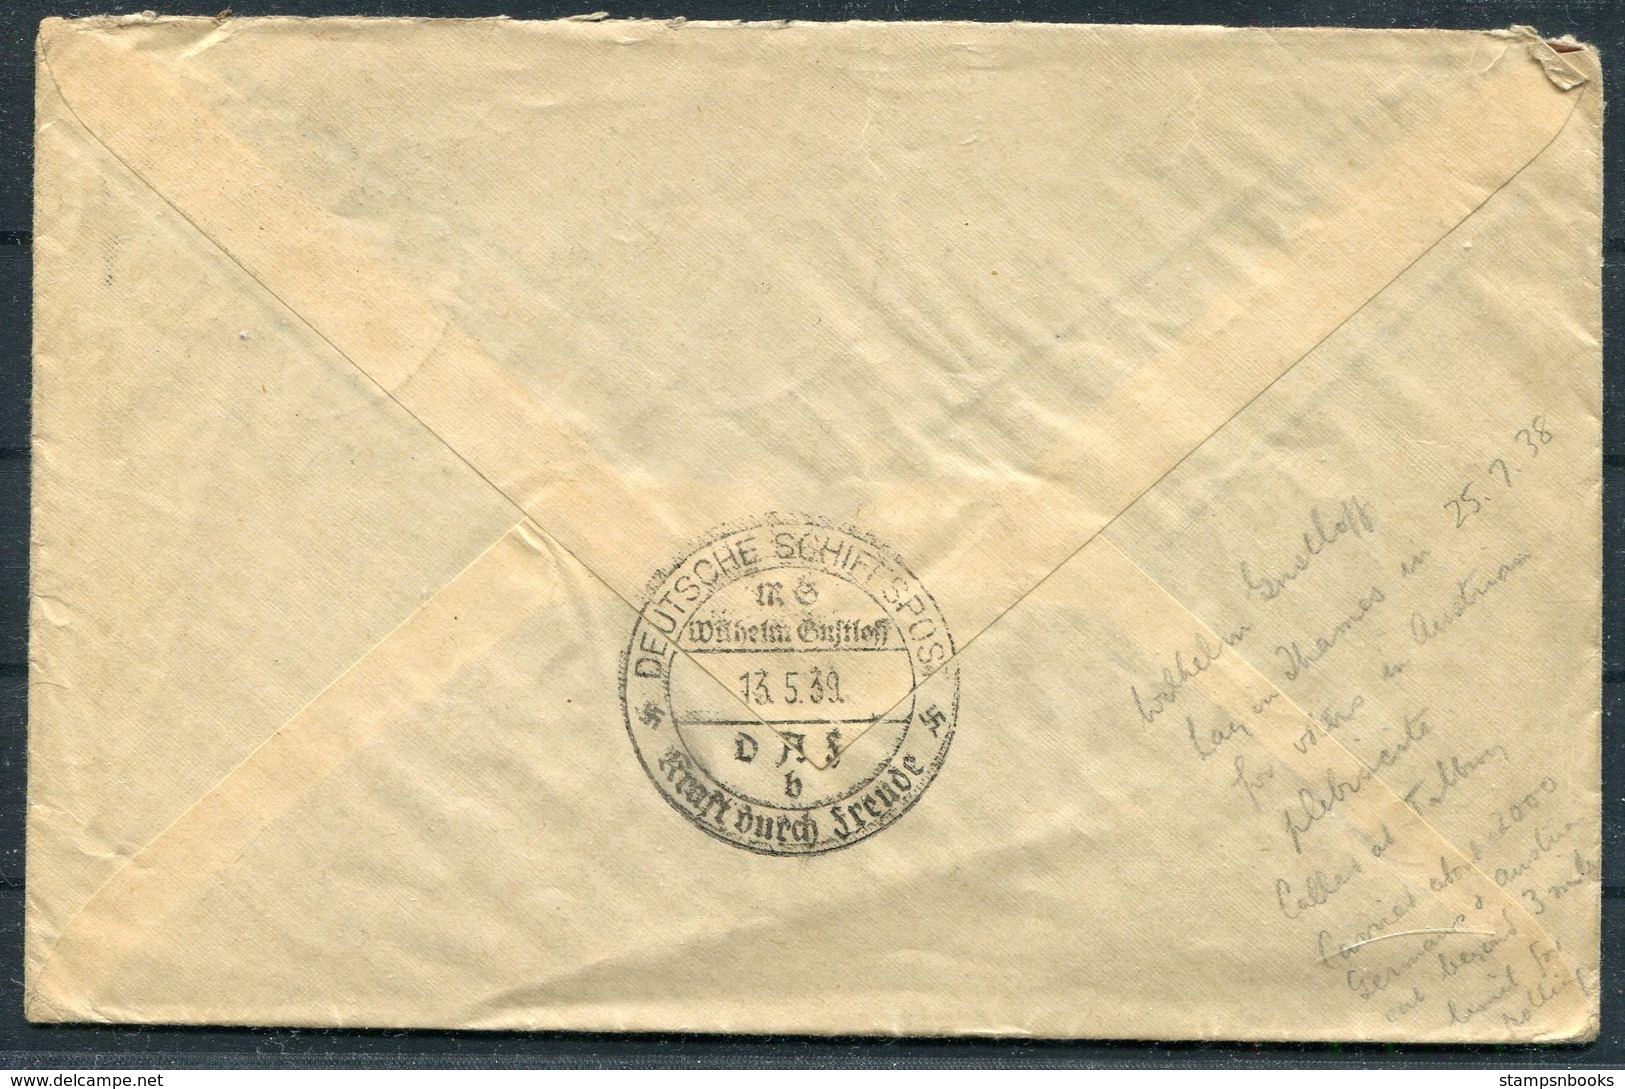 1939 Germany Deutsche Schiffspost D.A.S. Ship Kraft Durch Freude Cover - Wien Austria - Briefe U. Dokumente